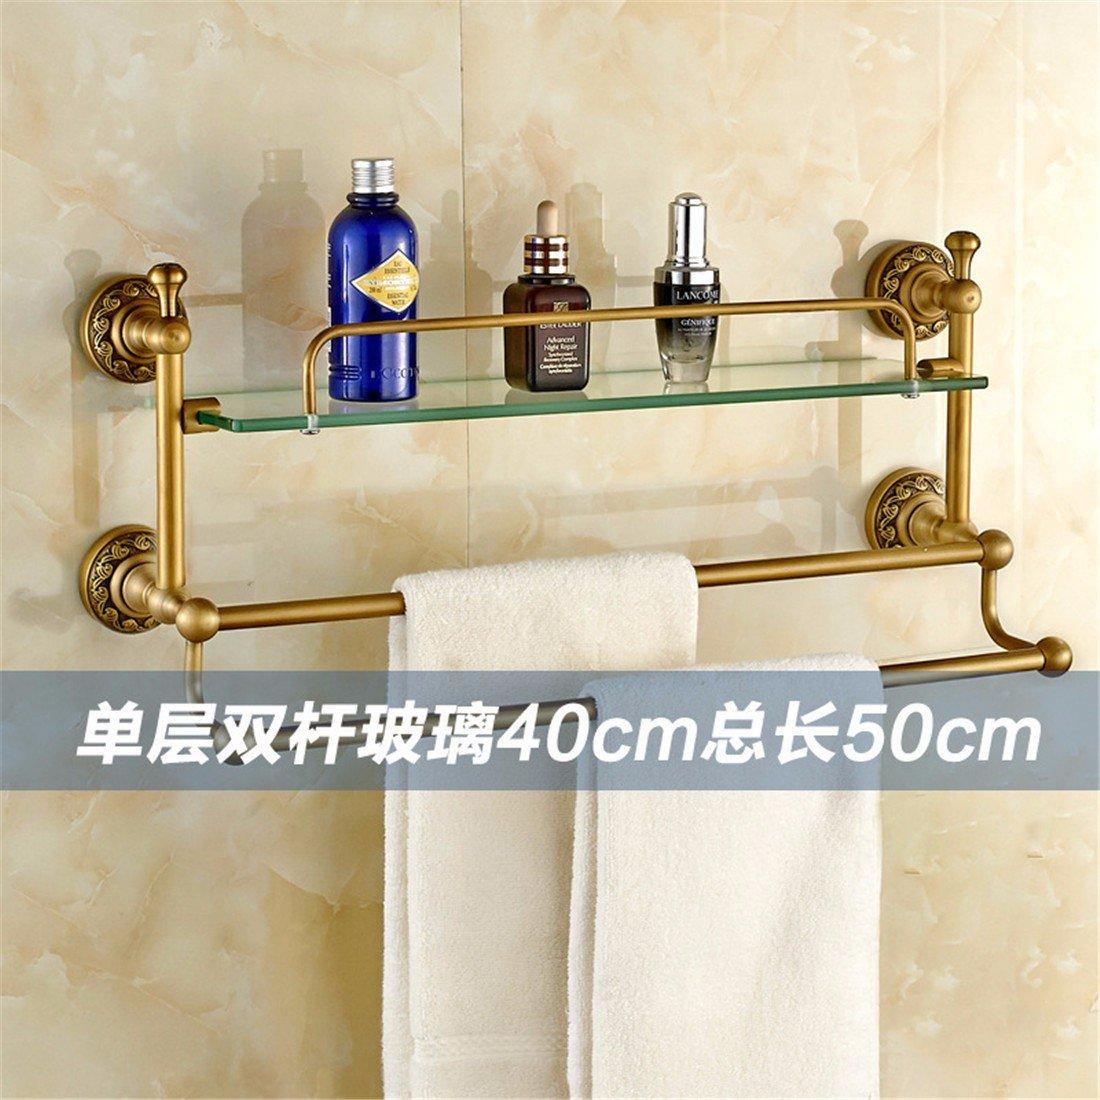 LAONA All copper antique European carved base, bathroom accessories, set rack, towel bar, toilet paper rack,Shelf 1 B 50cm